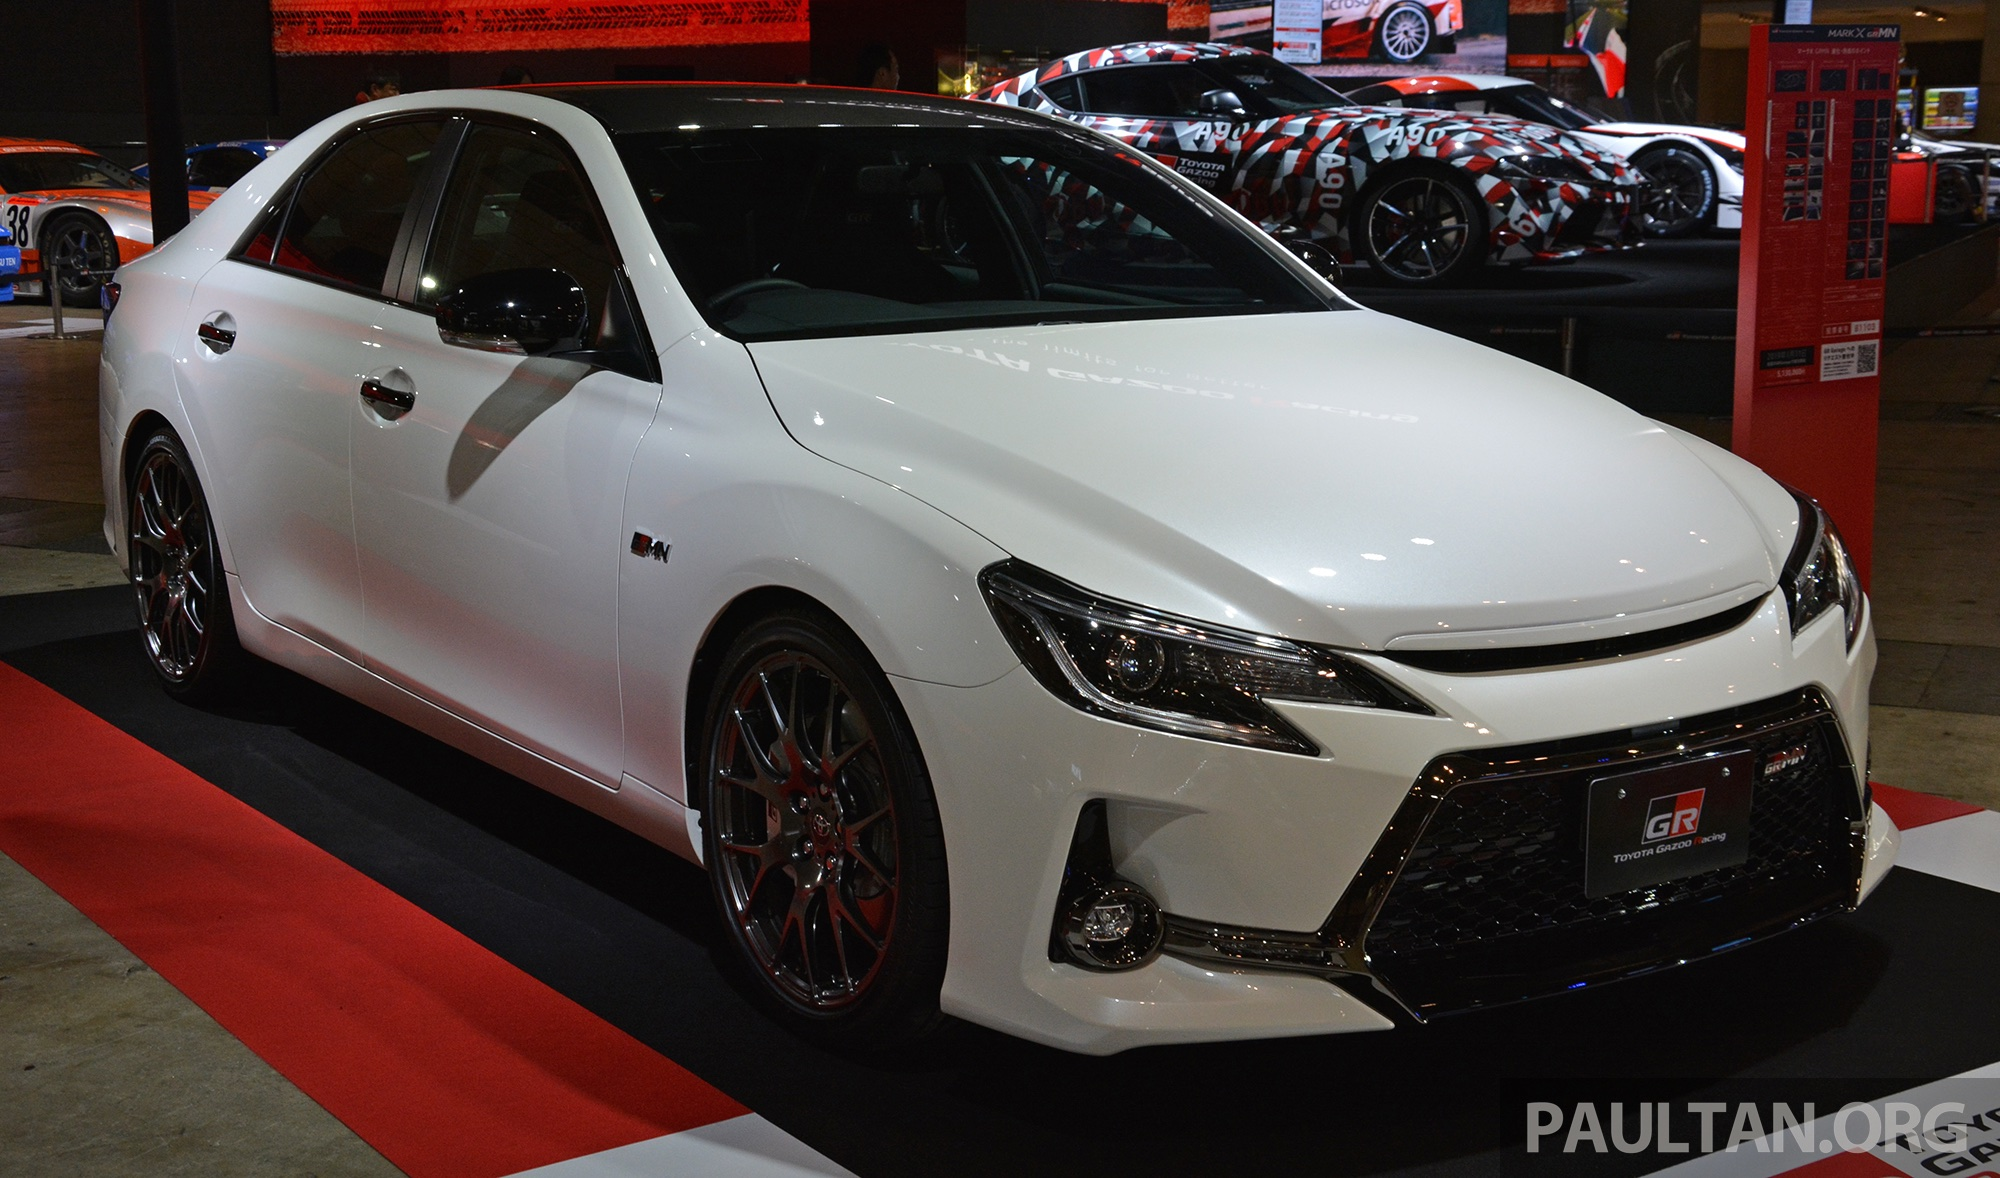 Tas 2019 Toyota Mark X Grmn Returns 318 Ps 3 5l Na V6 Six Speed Manual Limited To 350 Units Paultan Org